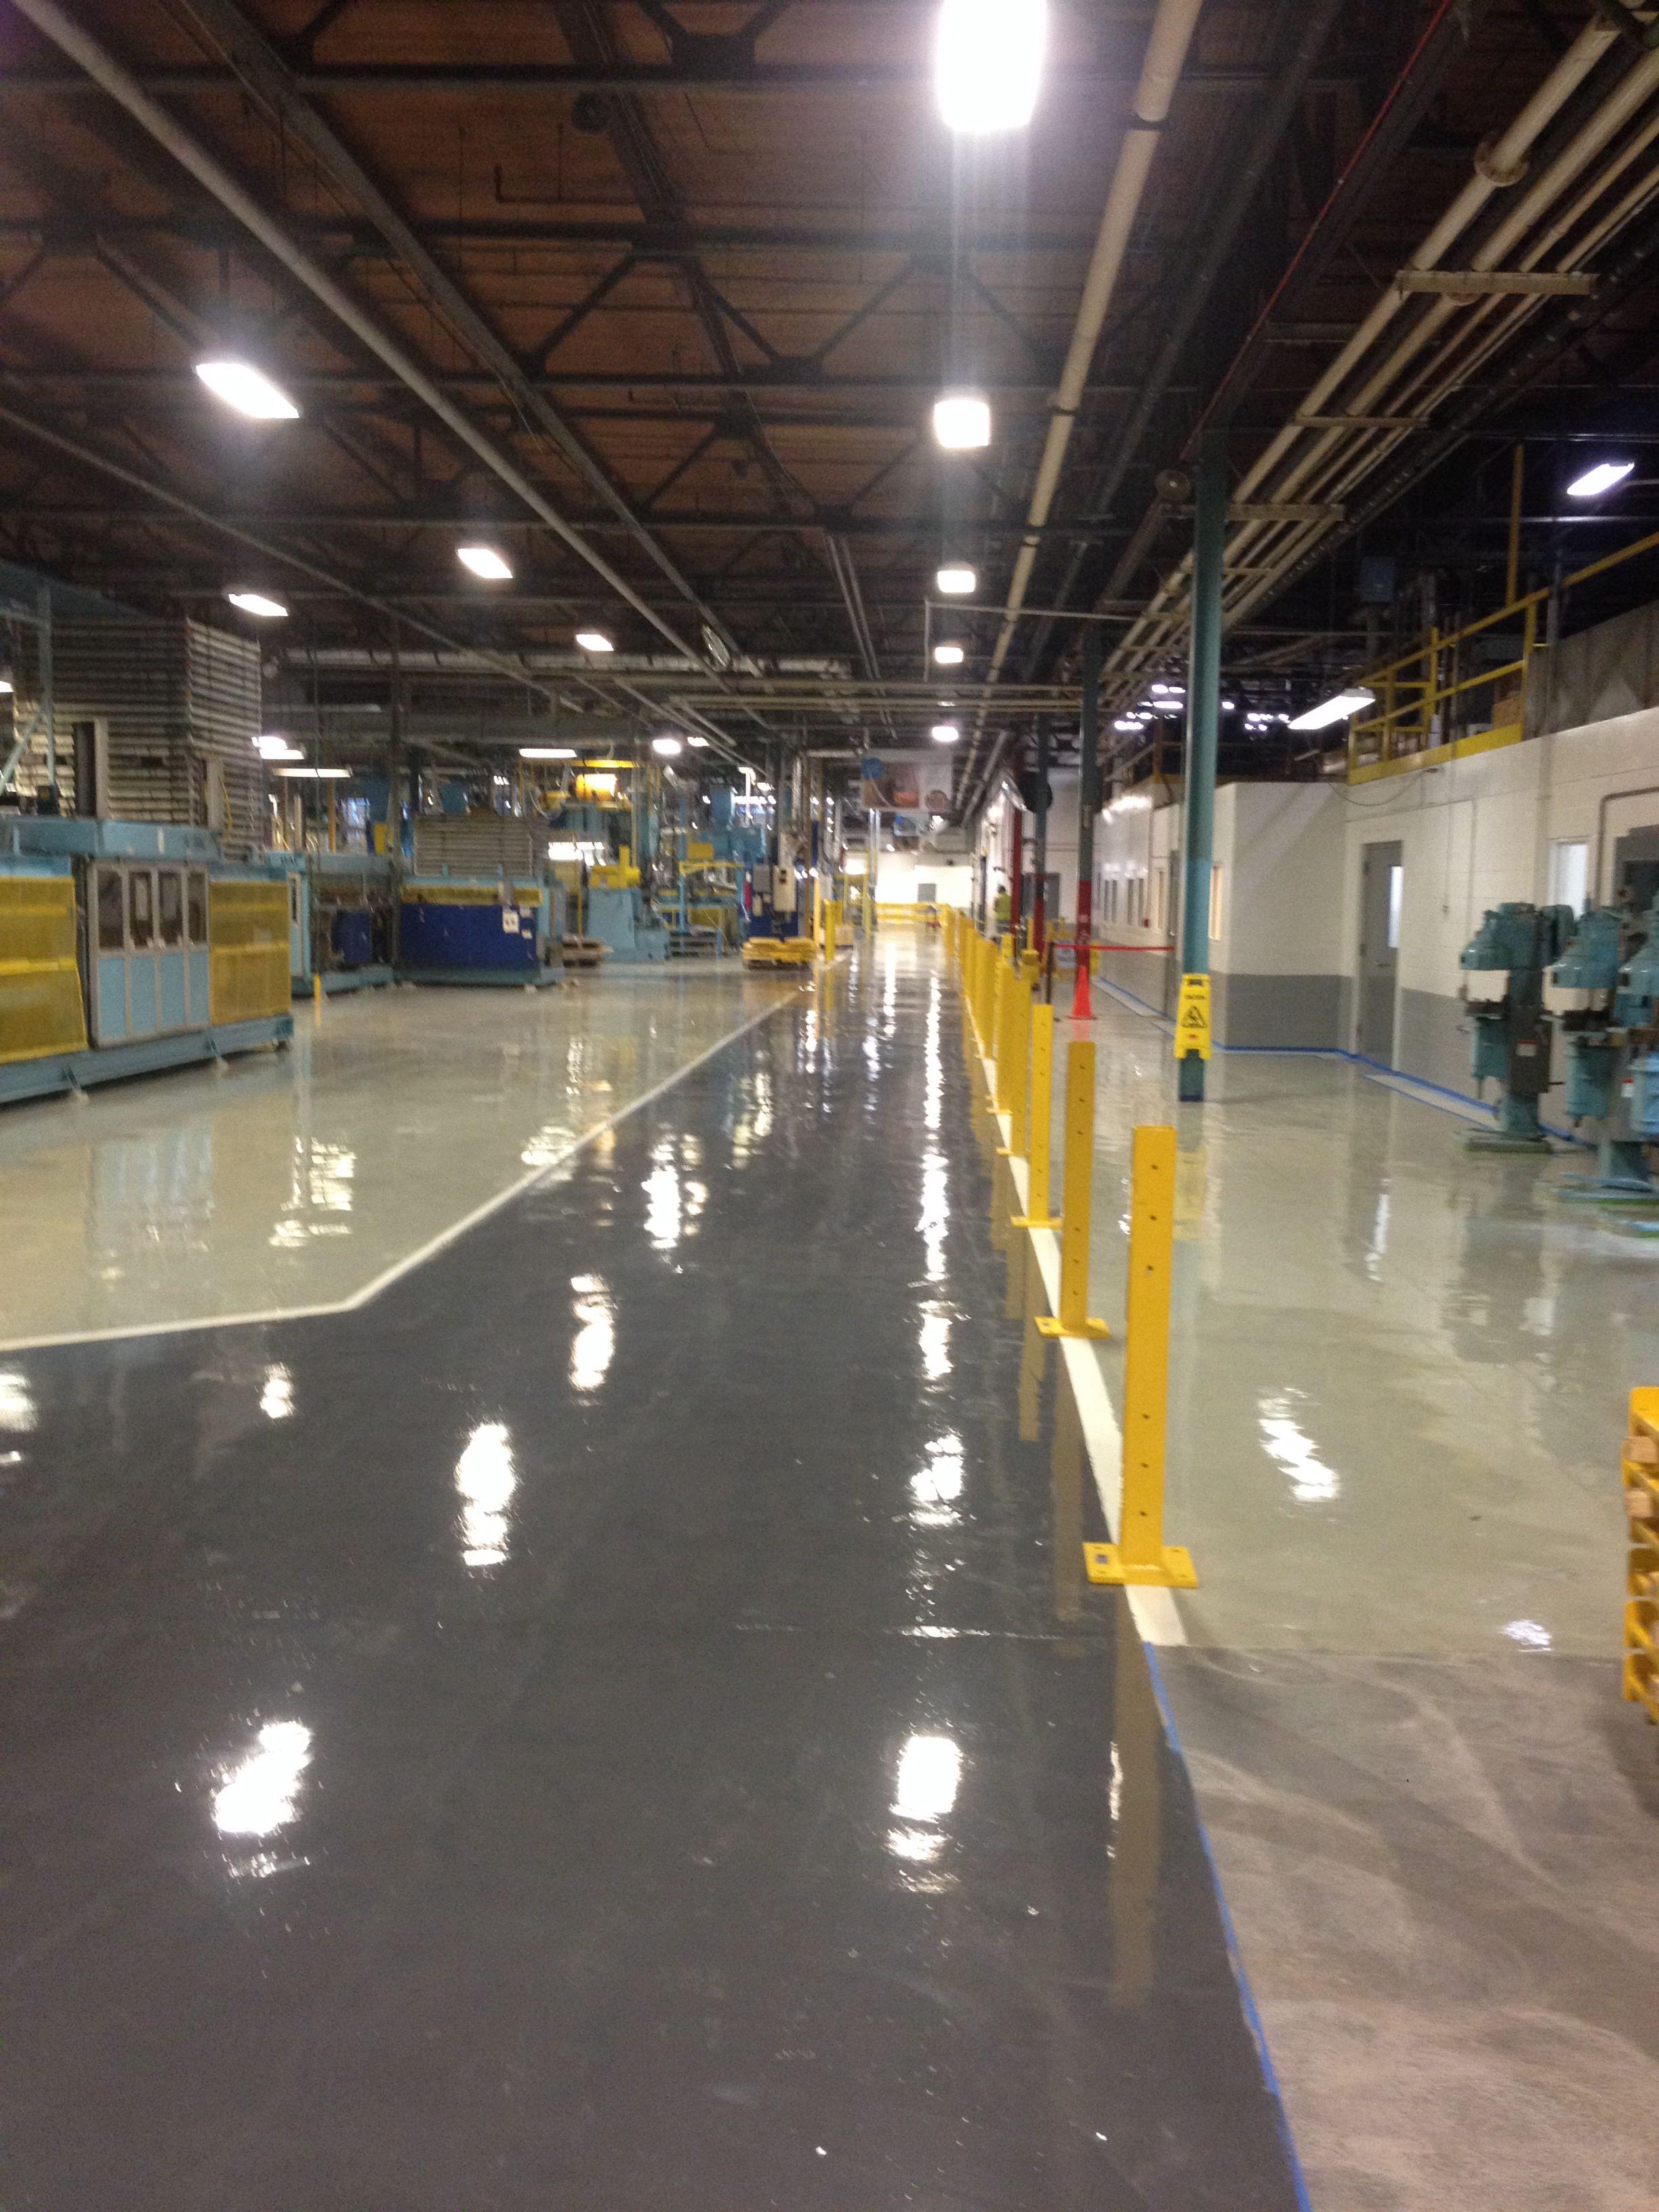 Industrial Neat Epoxy Resinous Floor By Elite Crete Systems Quartz Flooring Concrete Decor Interior And Exterior